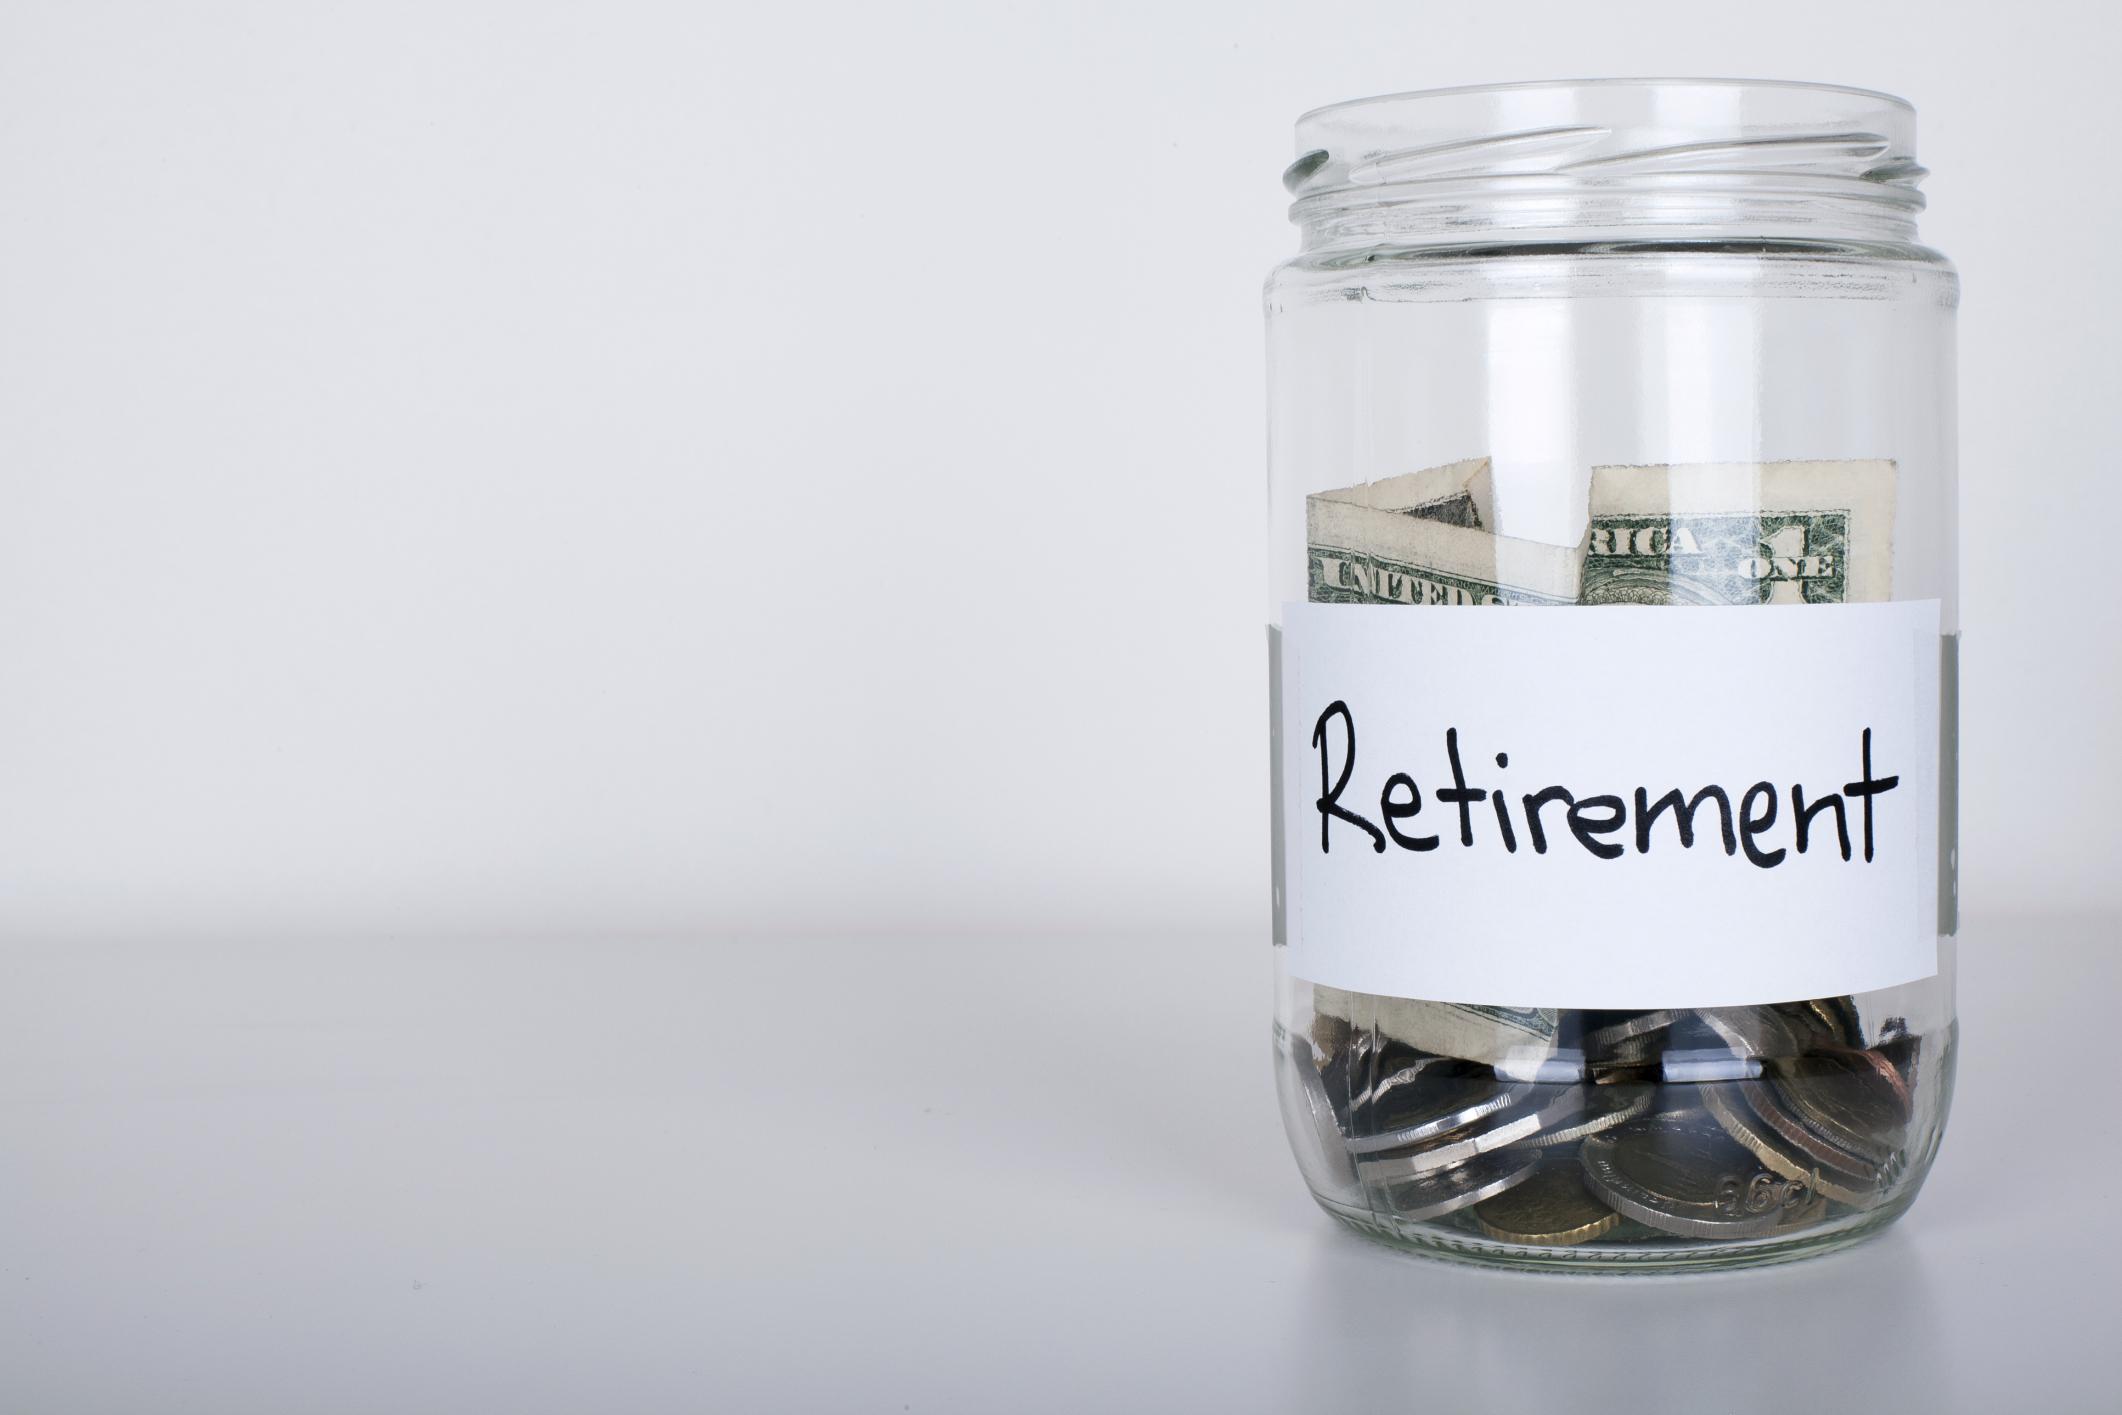 2018 Retirement Plan Contribution Limits | The Motley Fool